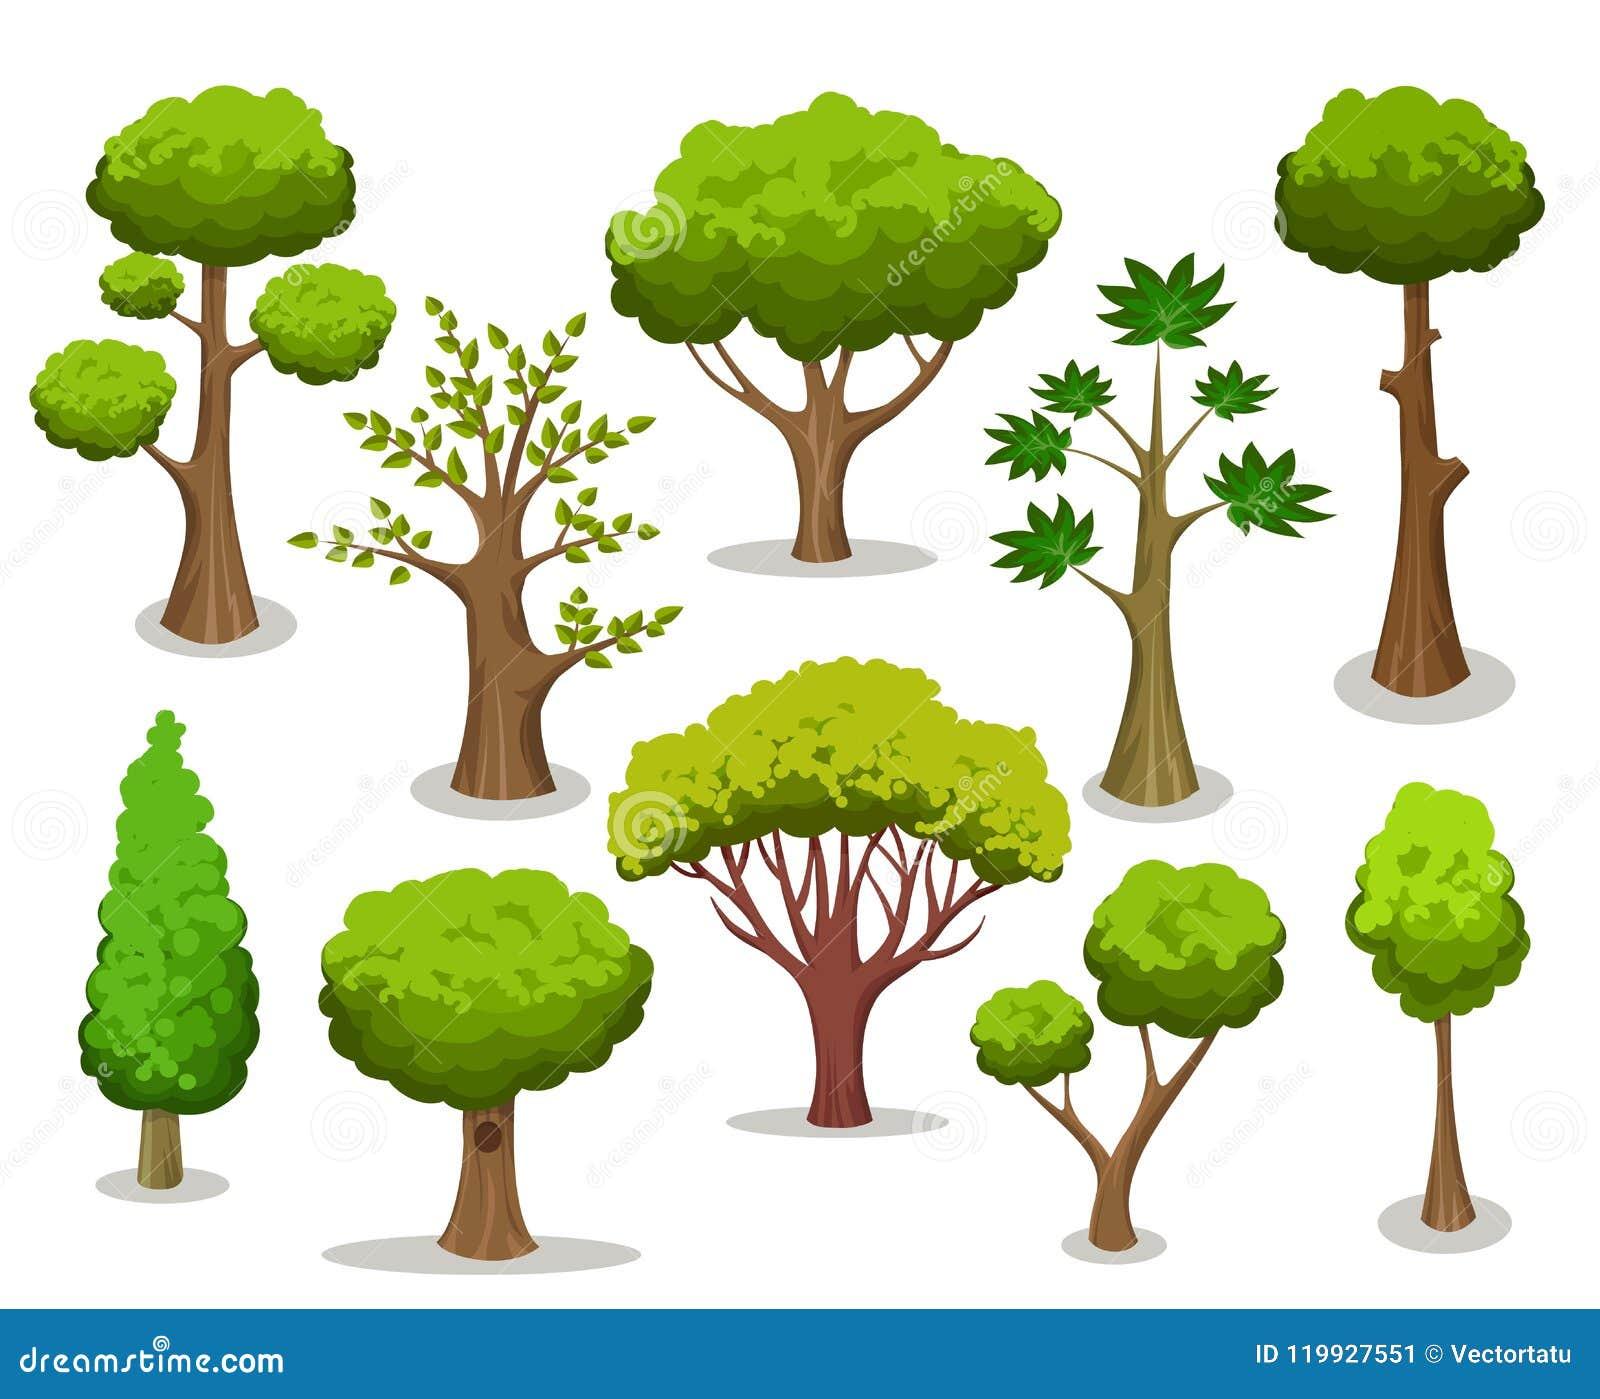 Cartoon tree collection stock vector. Illustration of ...